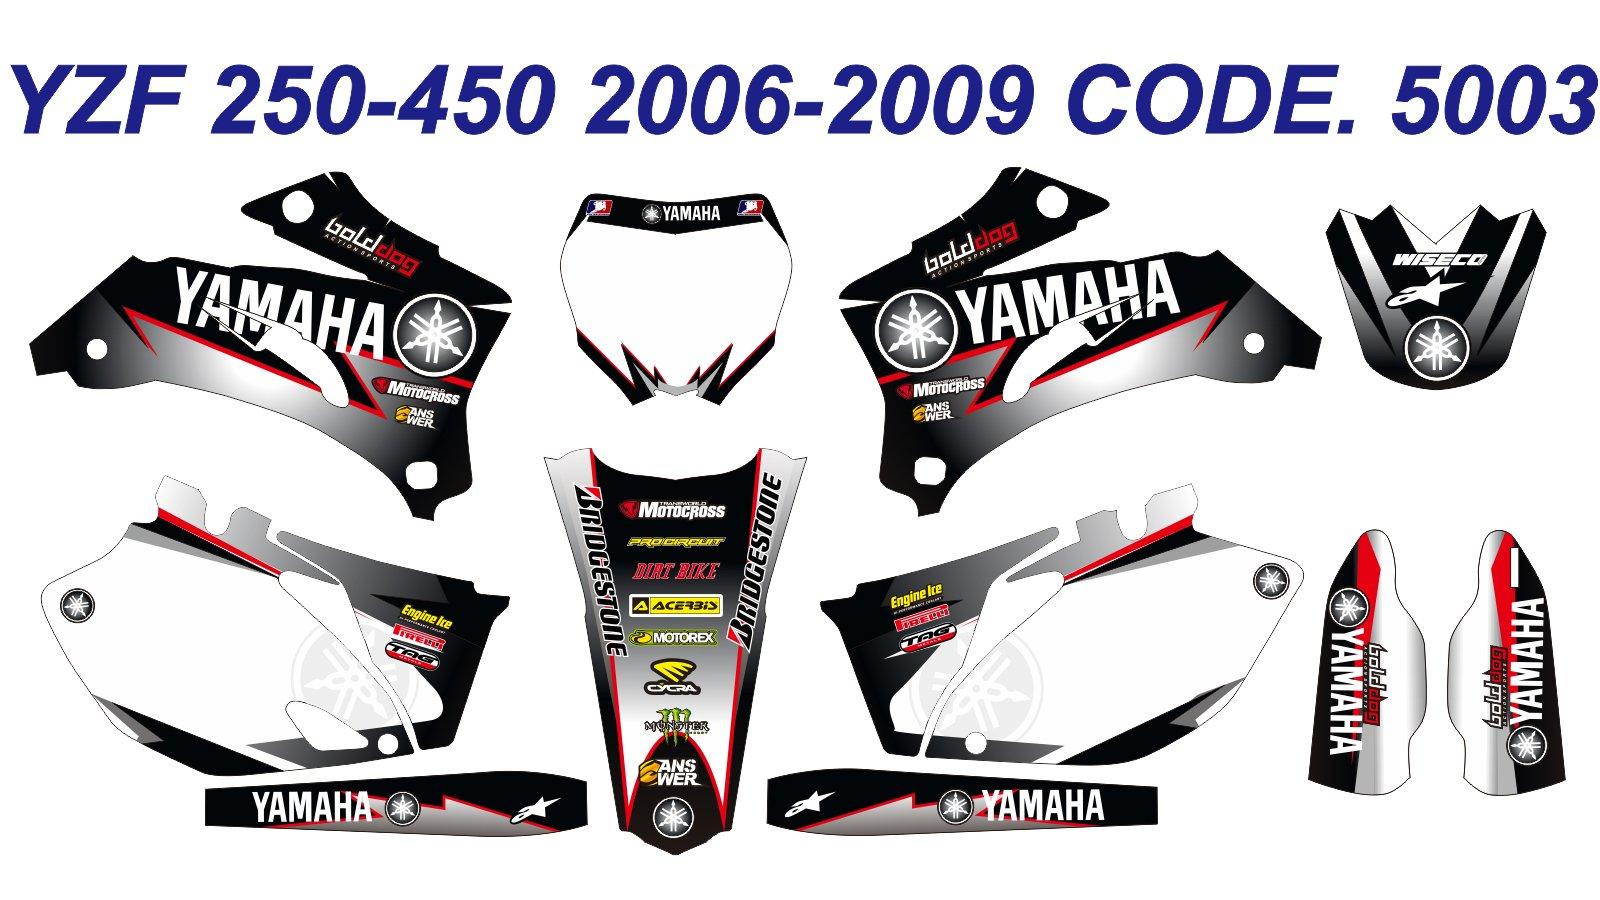 5003 YAMAHA YZ250F YZ450F 2006-2009 06-09 DECALS STICKERS GRAPHICS KIT